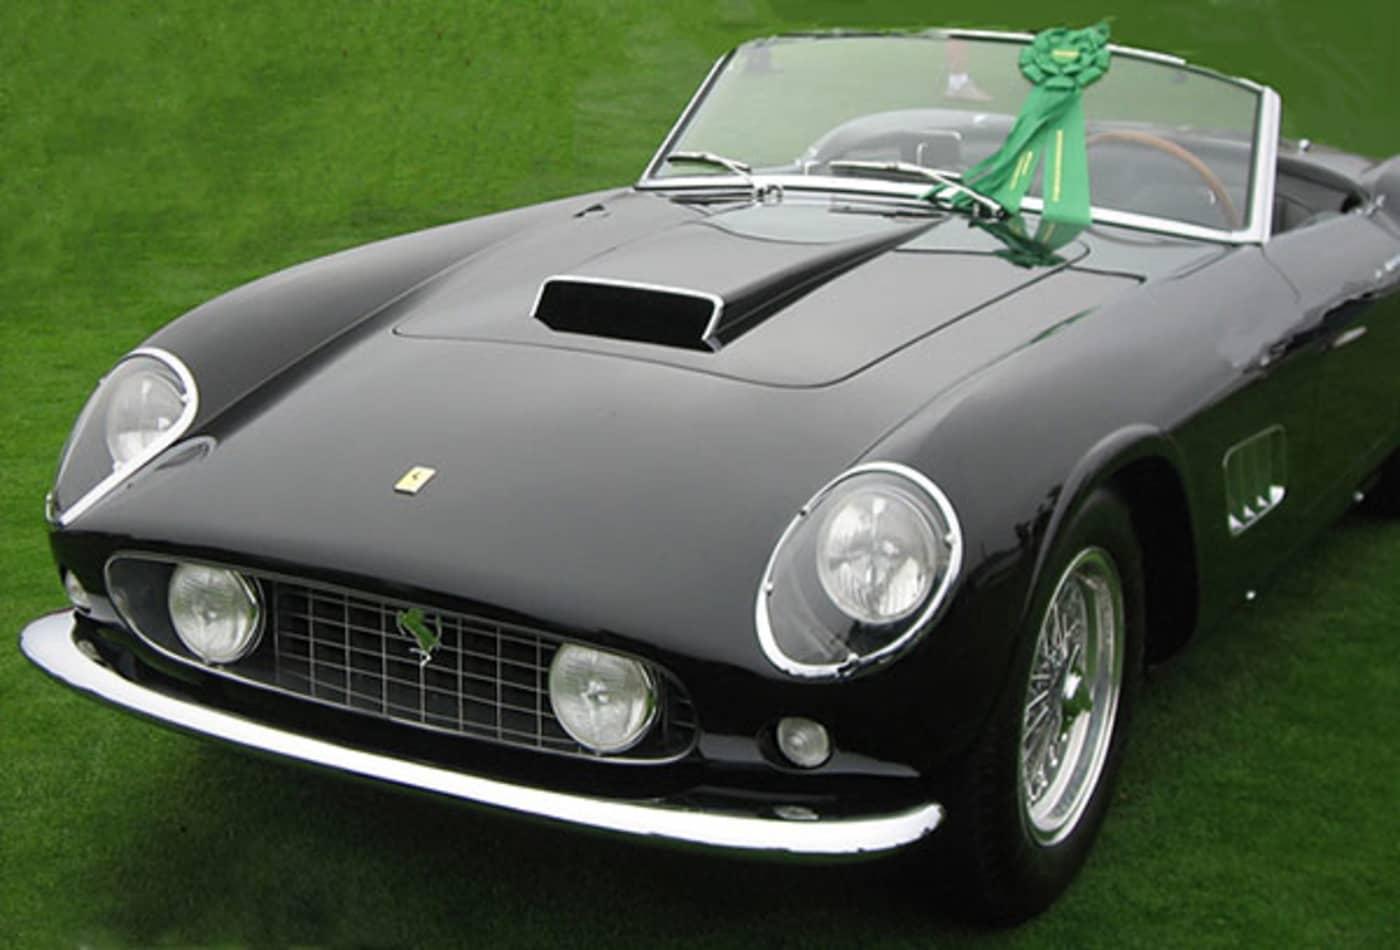 48724587 Ferrari-250-GT-Top-10-Best-Looking-Cars-All-Time-CNBC-2.jpg